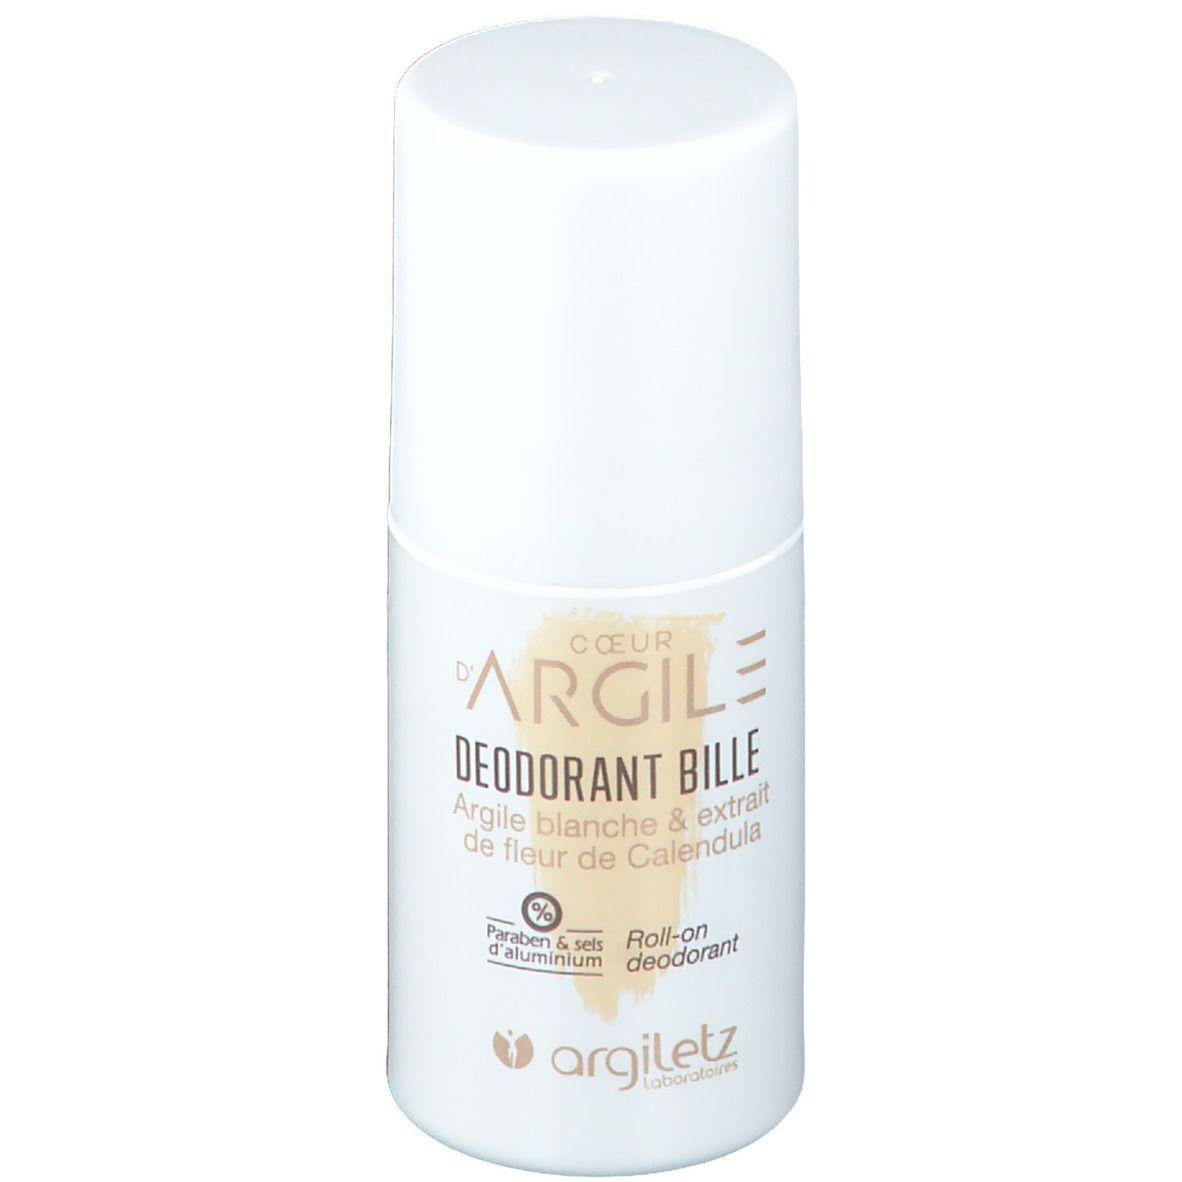 Image of argiletz Deodorant Roll-On